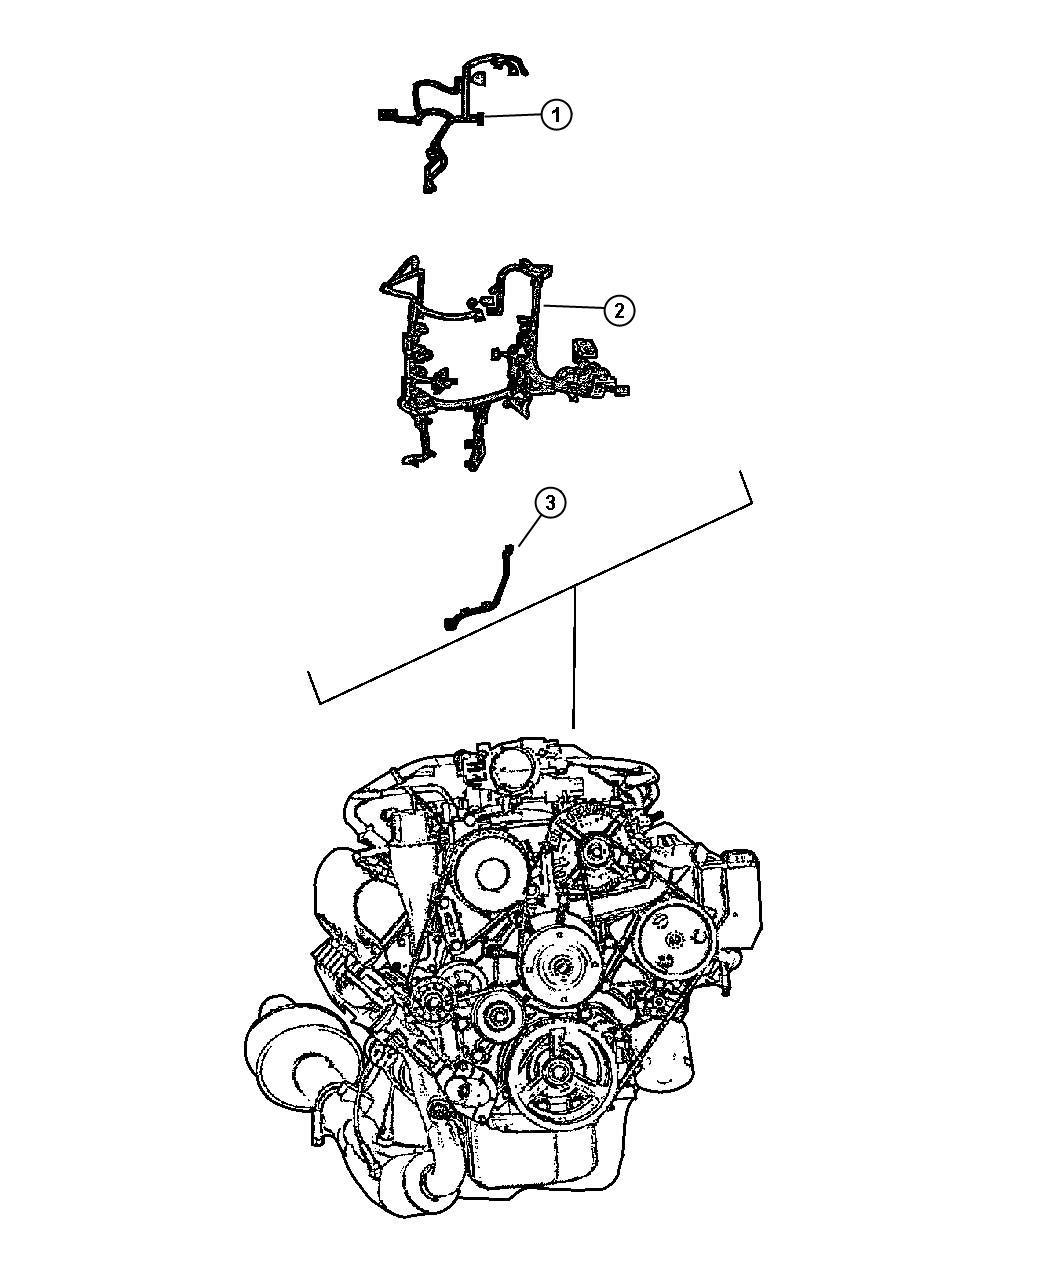 4 Prong Wiring Diagram Alternator